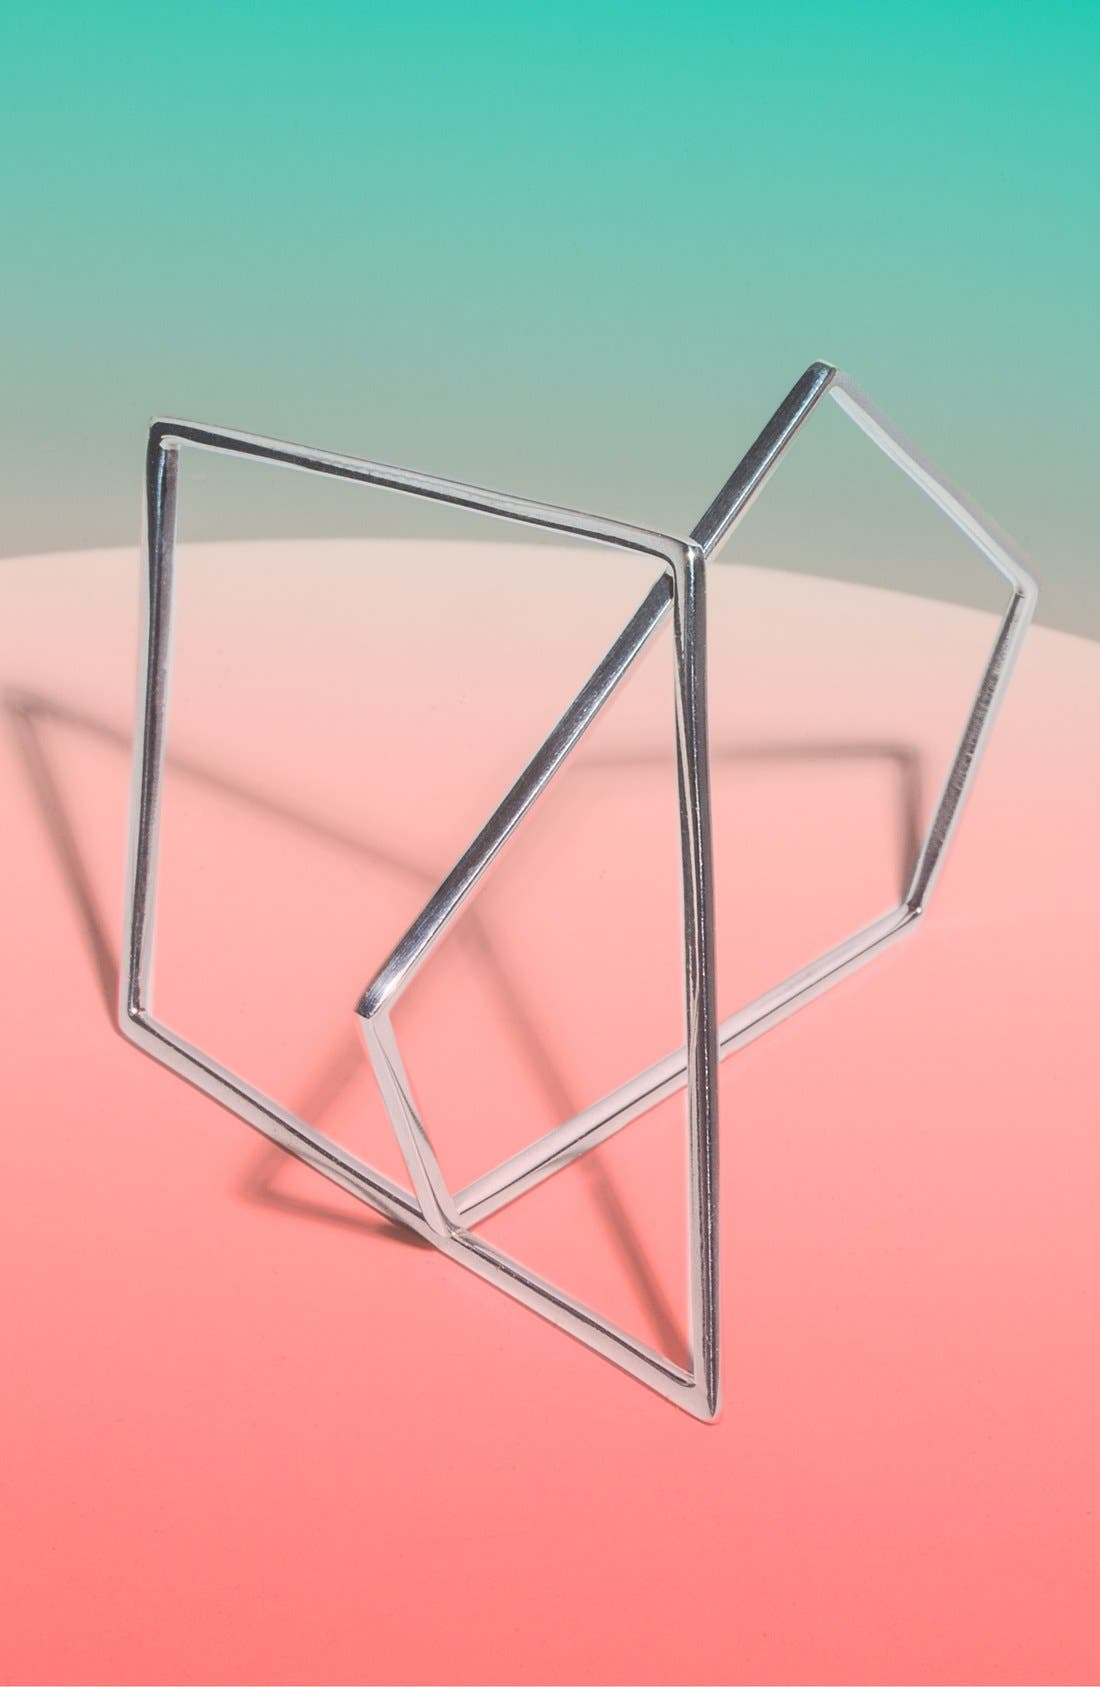 Alternate Image 1  - Moratorium Jewelry 'Angle Bangle' Sterling Silver Bracelets (Set of 2)